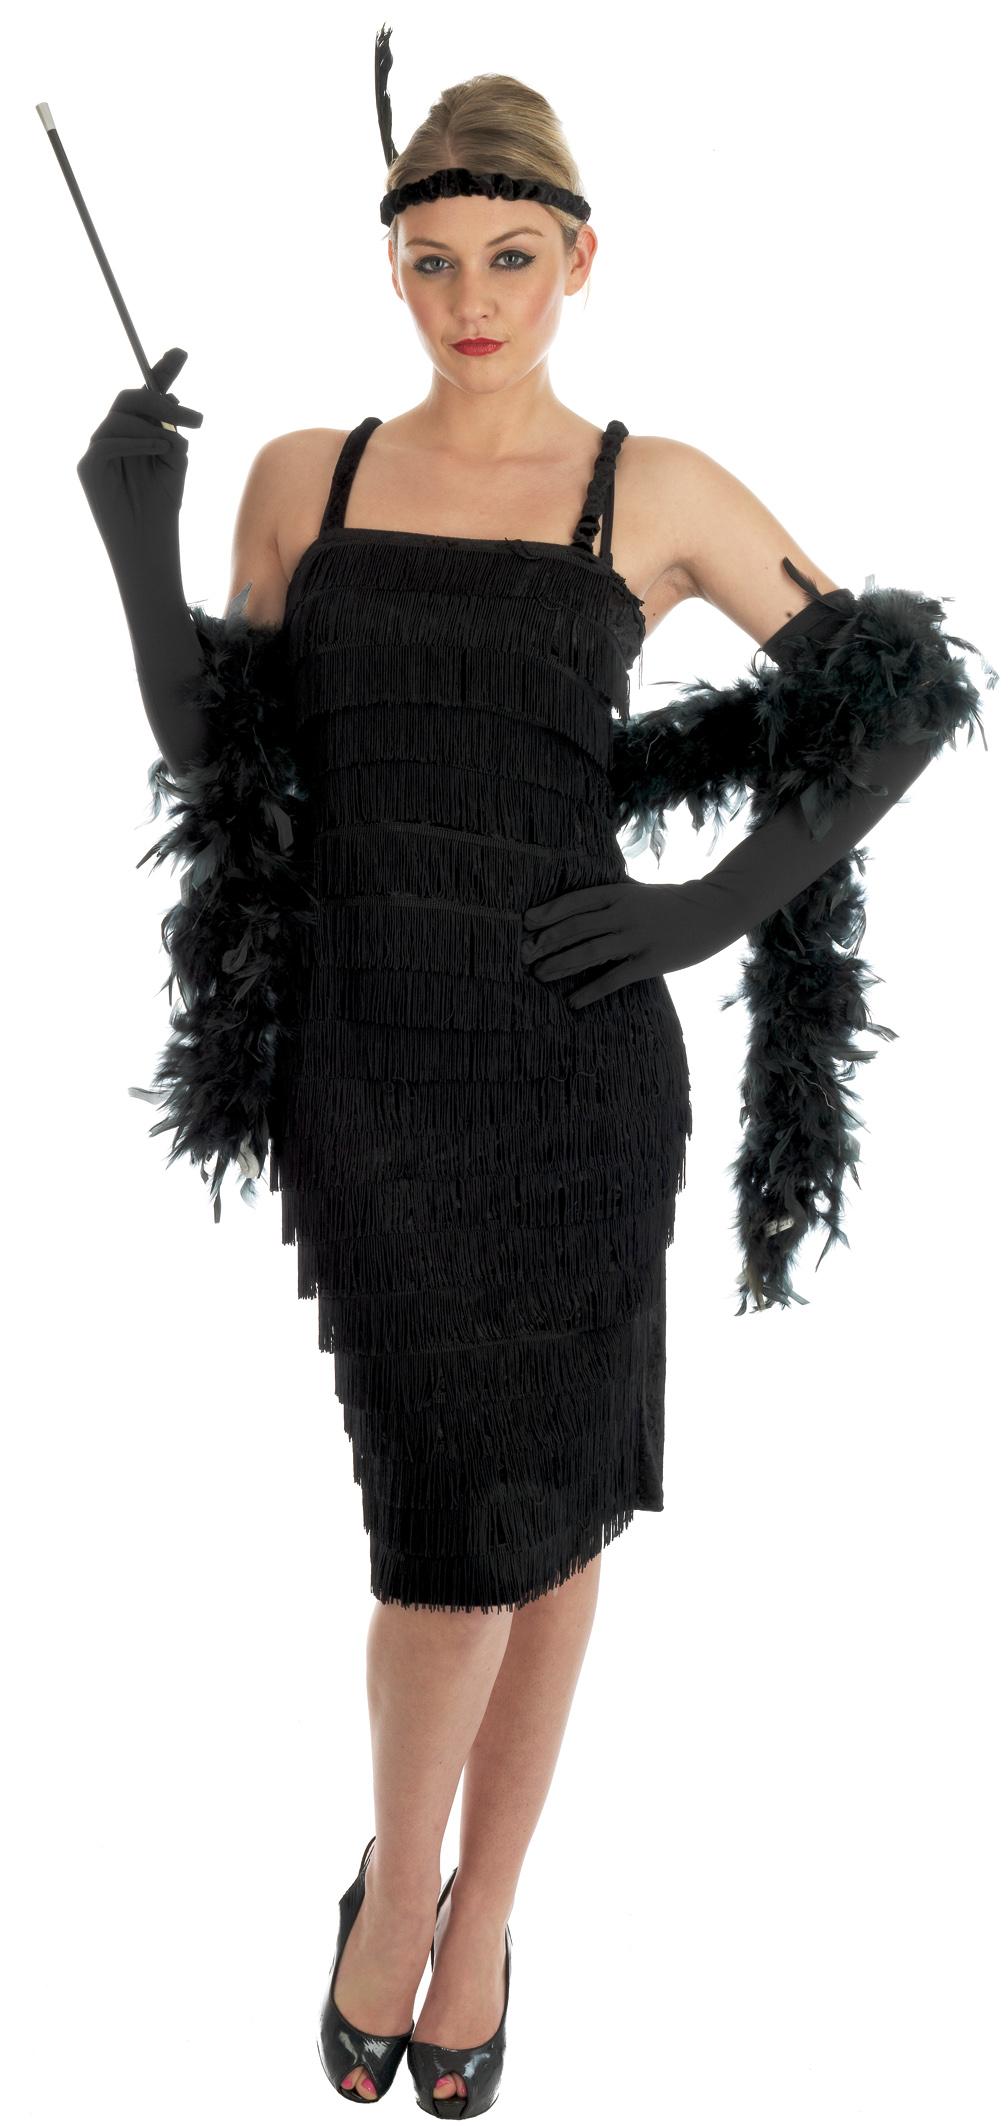 Black dress up gloves - 1920s Fringe Flapper Fancy Dress Charleston Ladies 20s